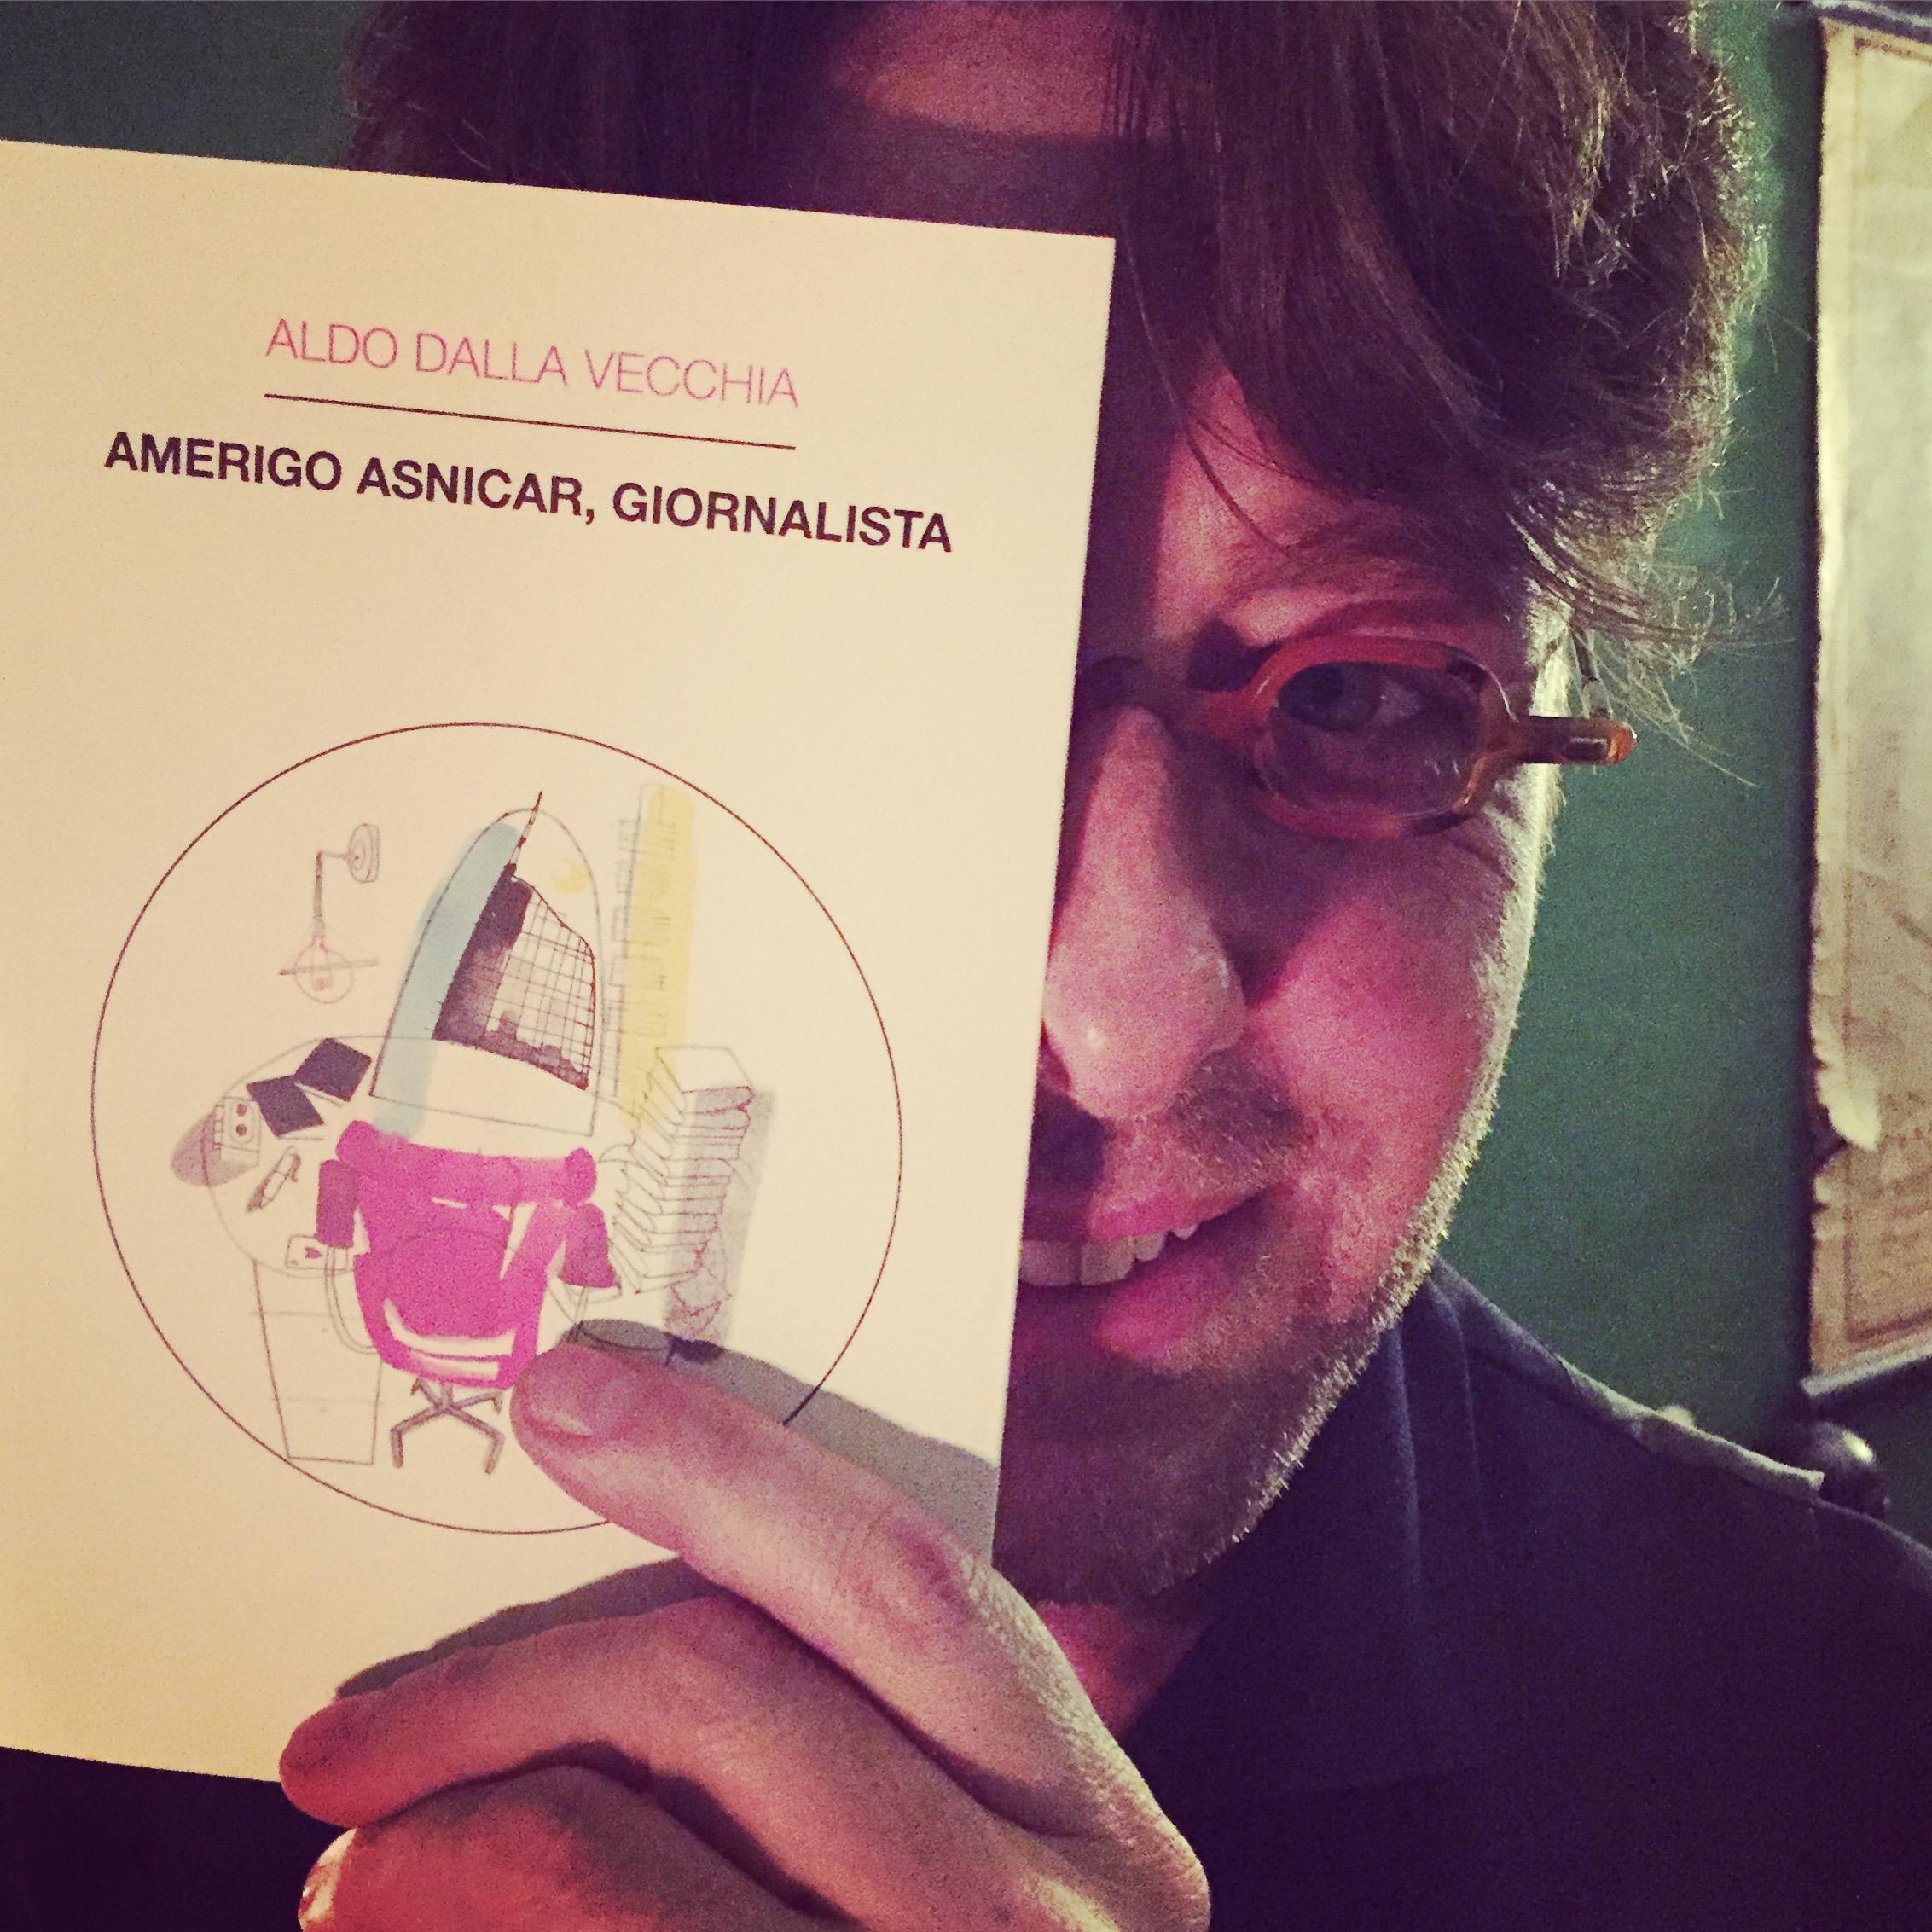 ALESSANDRO DI SARNO ♥ AMERIGO ASNICAR, GIORNALISTA  (Milano, giovedì 14 gennaio 2016).